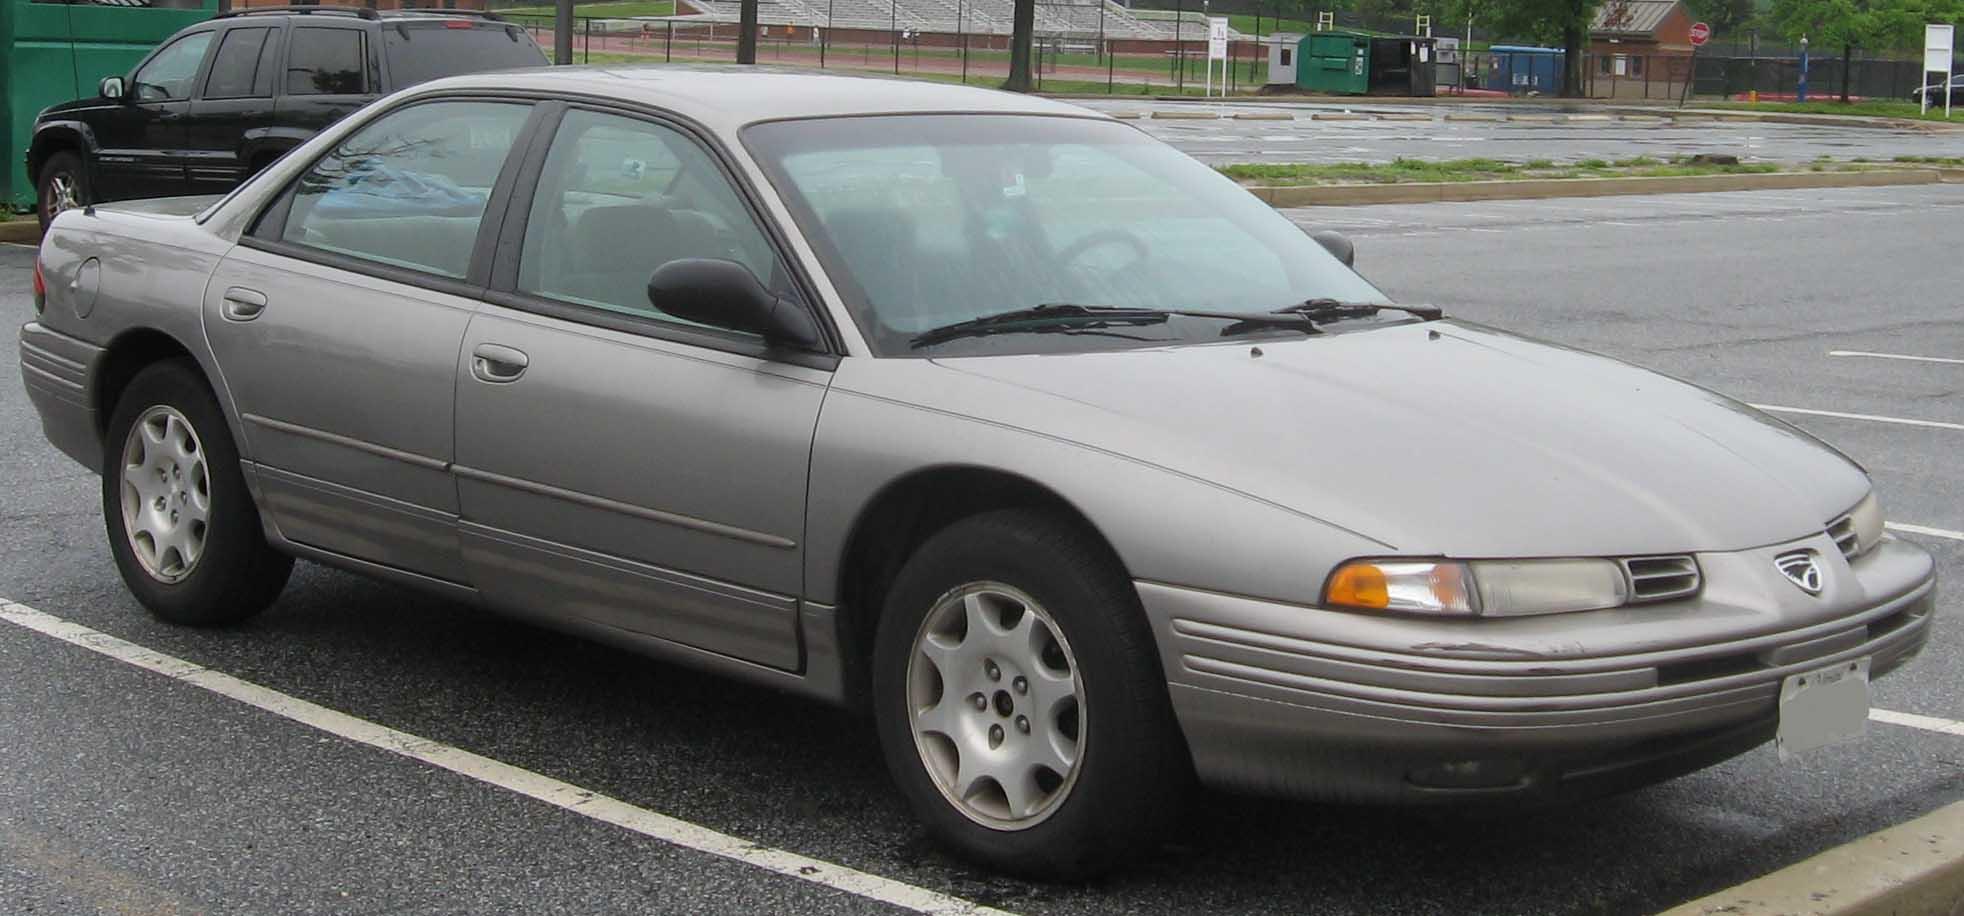 Chrysler Vision 1993 - 1997 Sedan #2